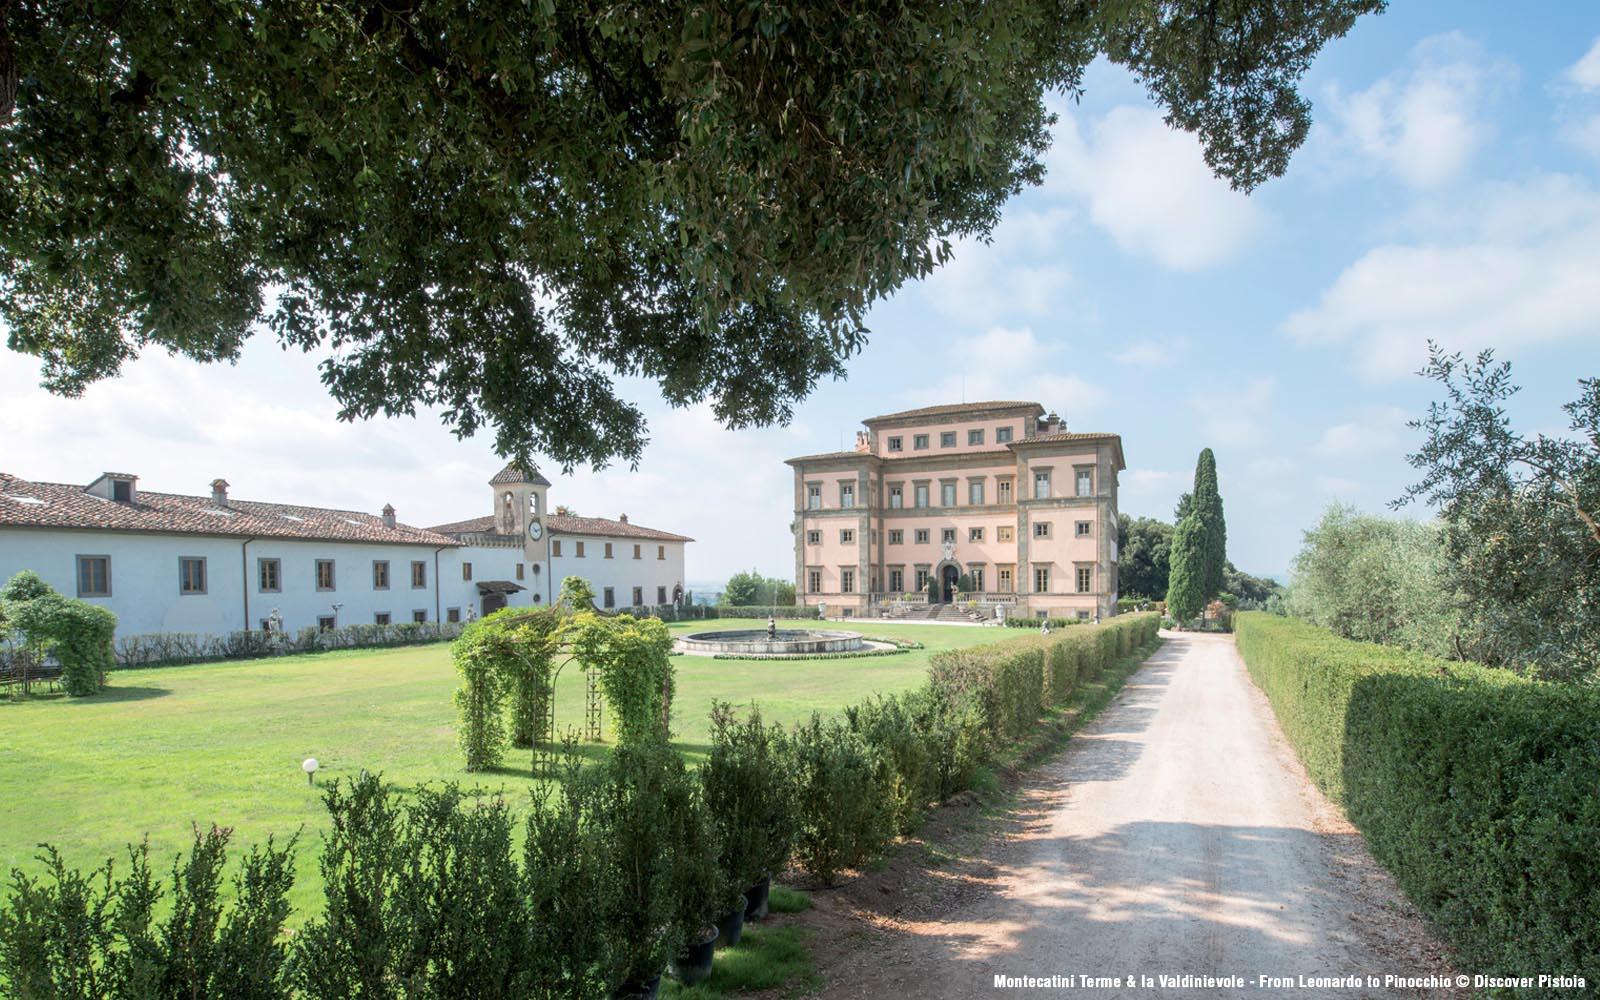 Villa Rospigliosi, Lamporecchio